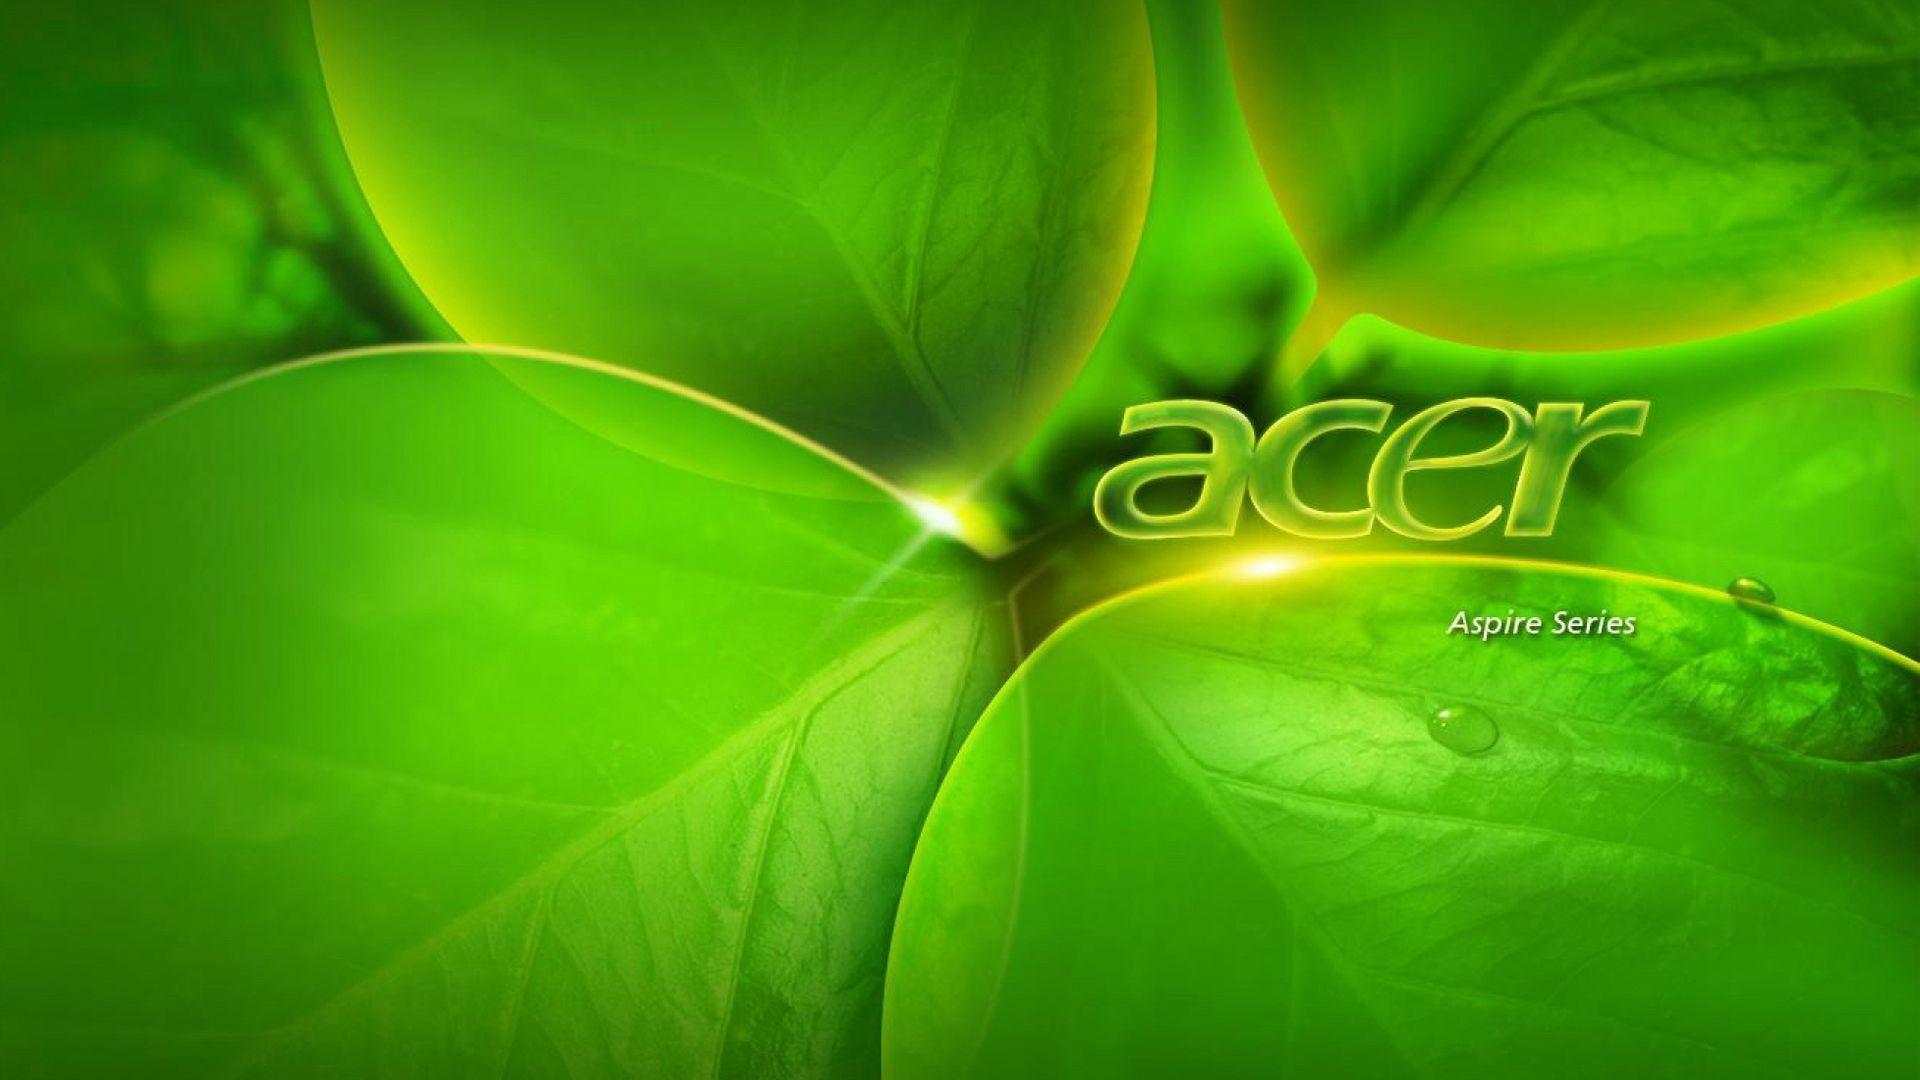 Acer Green